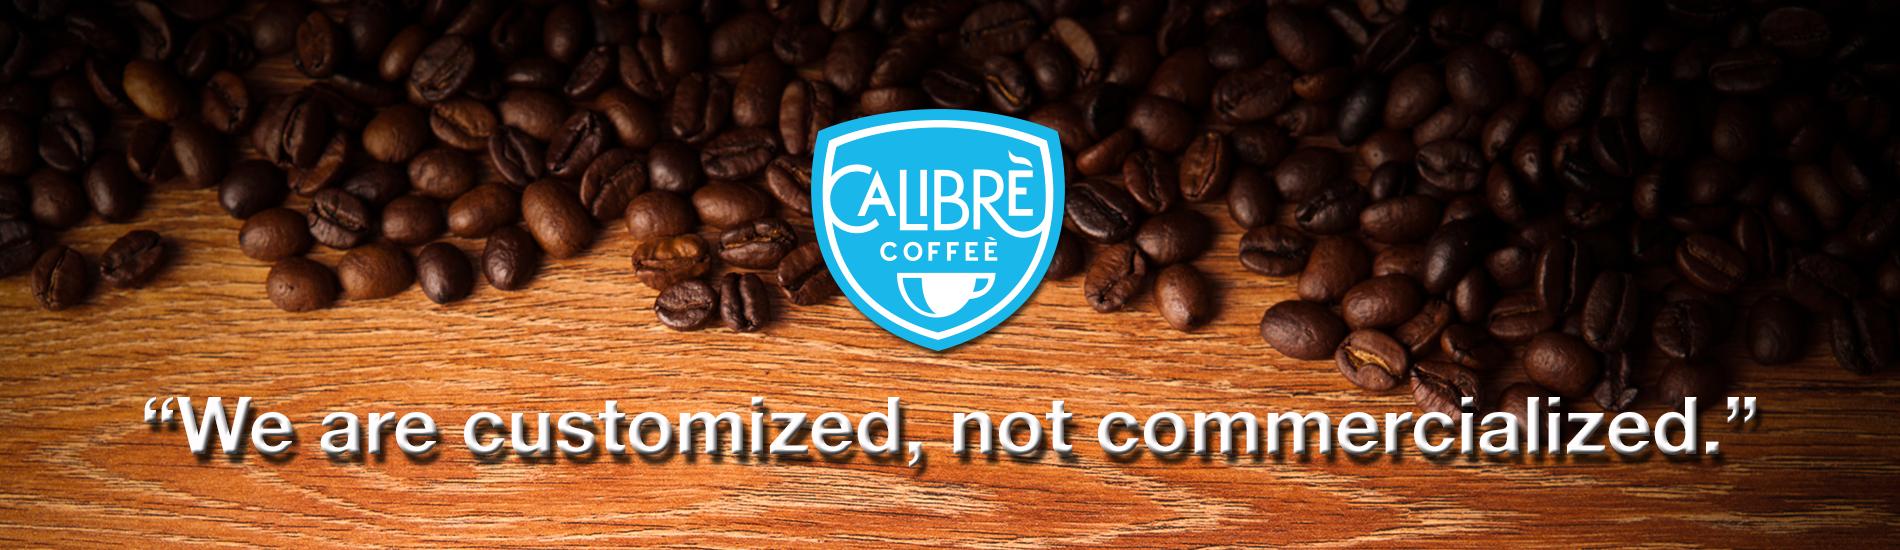 Calibre-coffee-customized